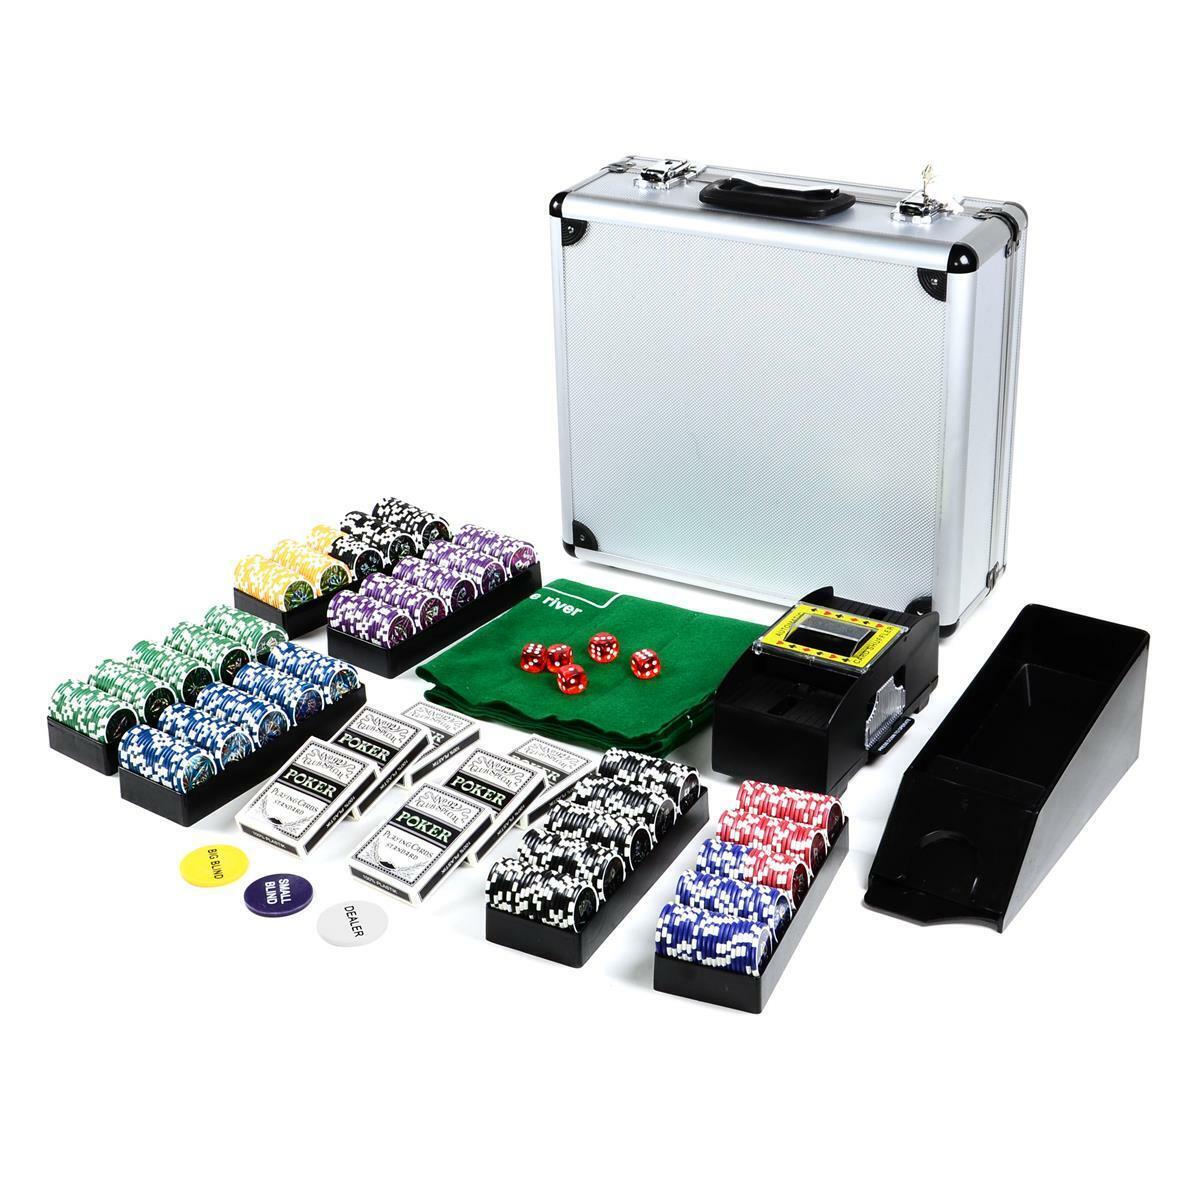 Poker Mallette set DELUXE 600 laser Ocean champion jetons de poker arrondi Malette